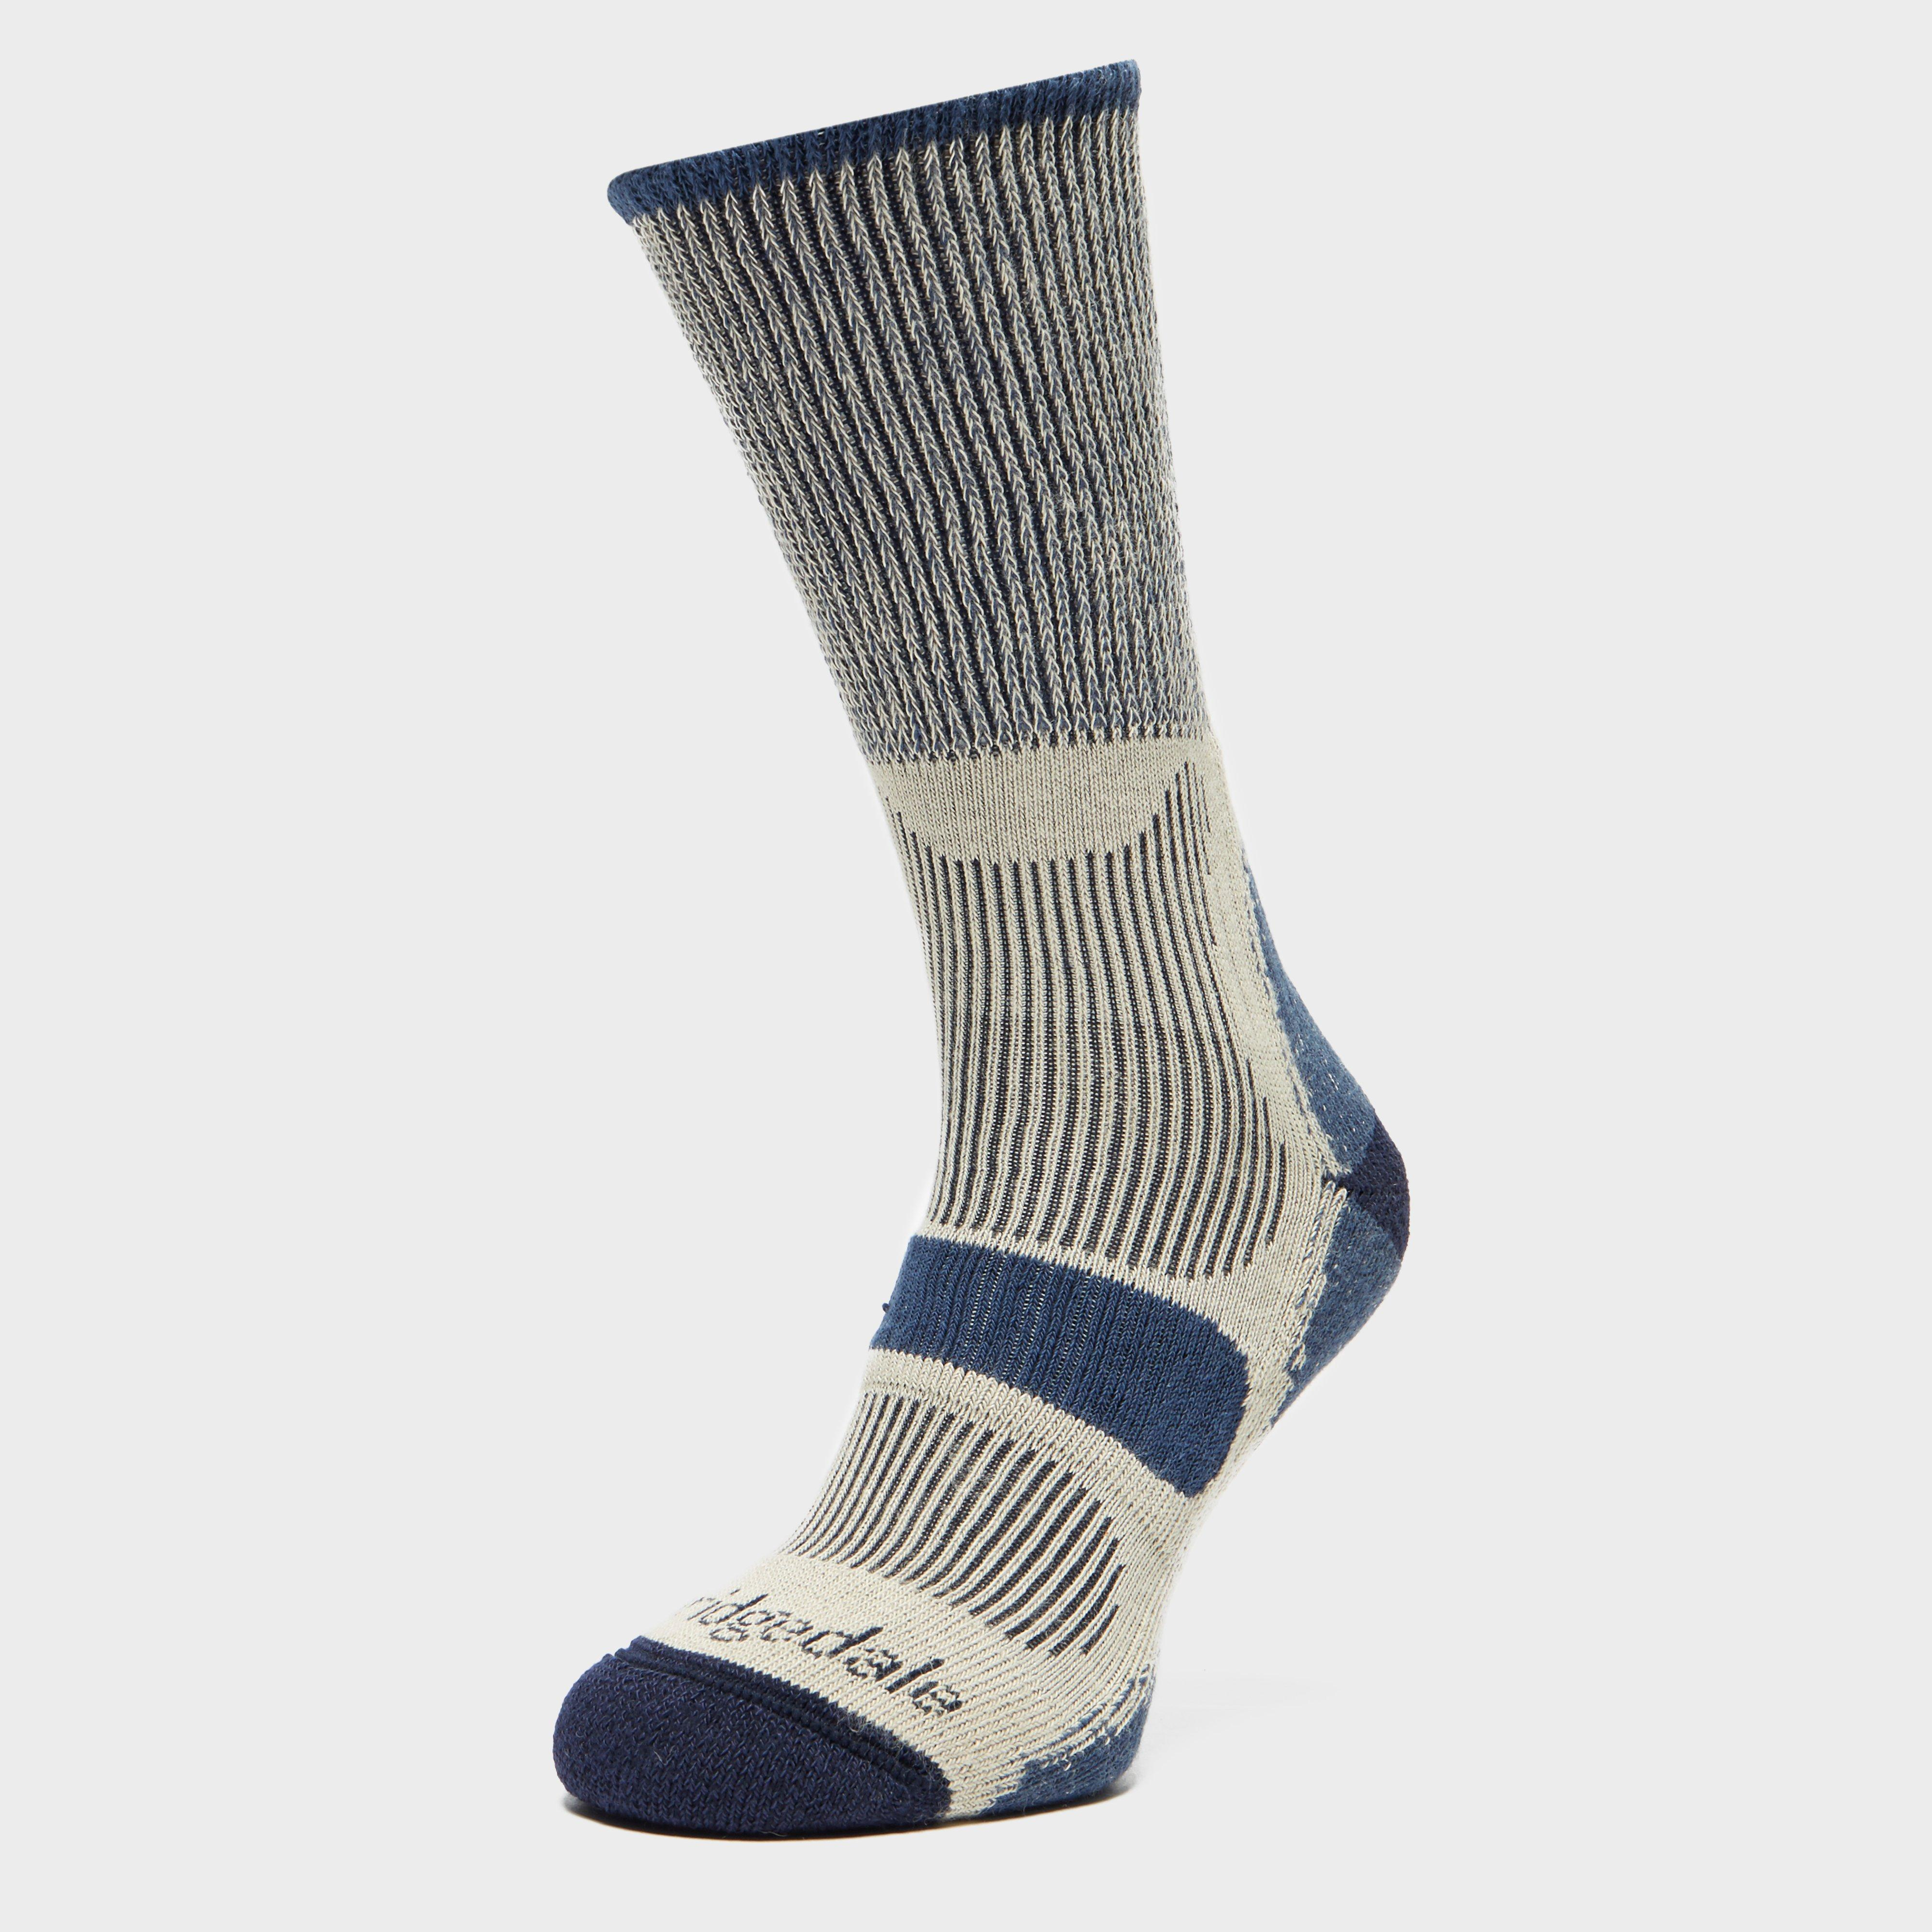 Bridgedale Bridgedale Mens Coolmax Light Hiker Sock - Blue, Blue